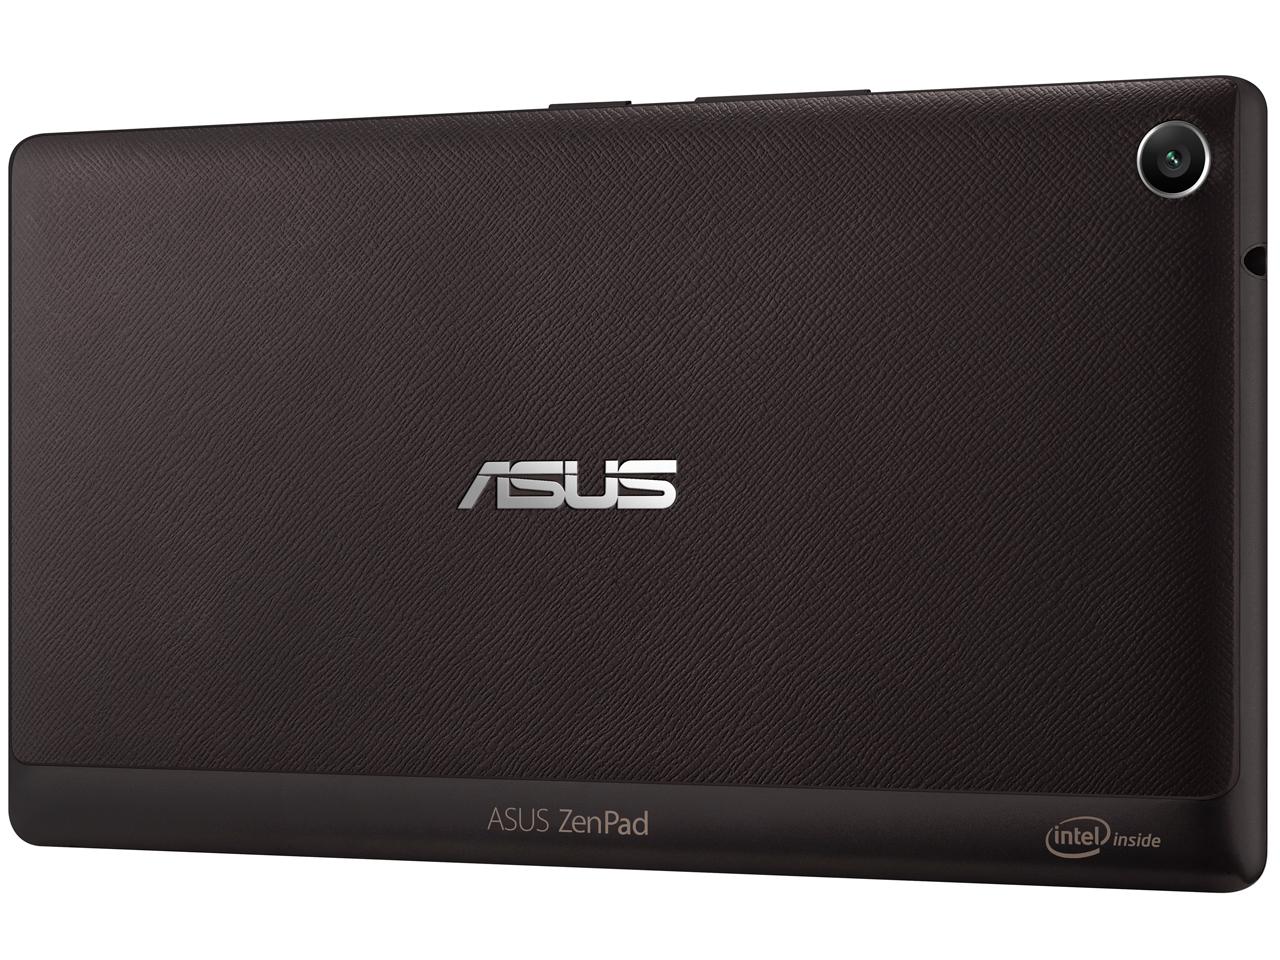 �w�{�� �w��2�x ASUS ZenPad 7.0 Z370C-BK16 [�u���b�N] �̐��i�摜